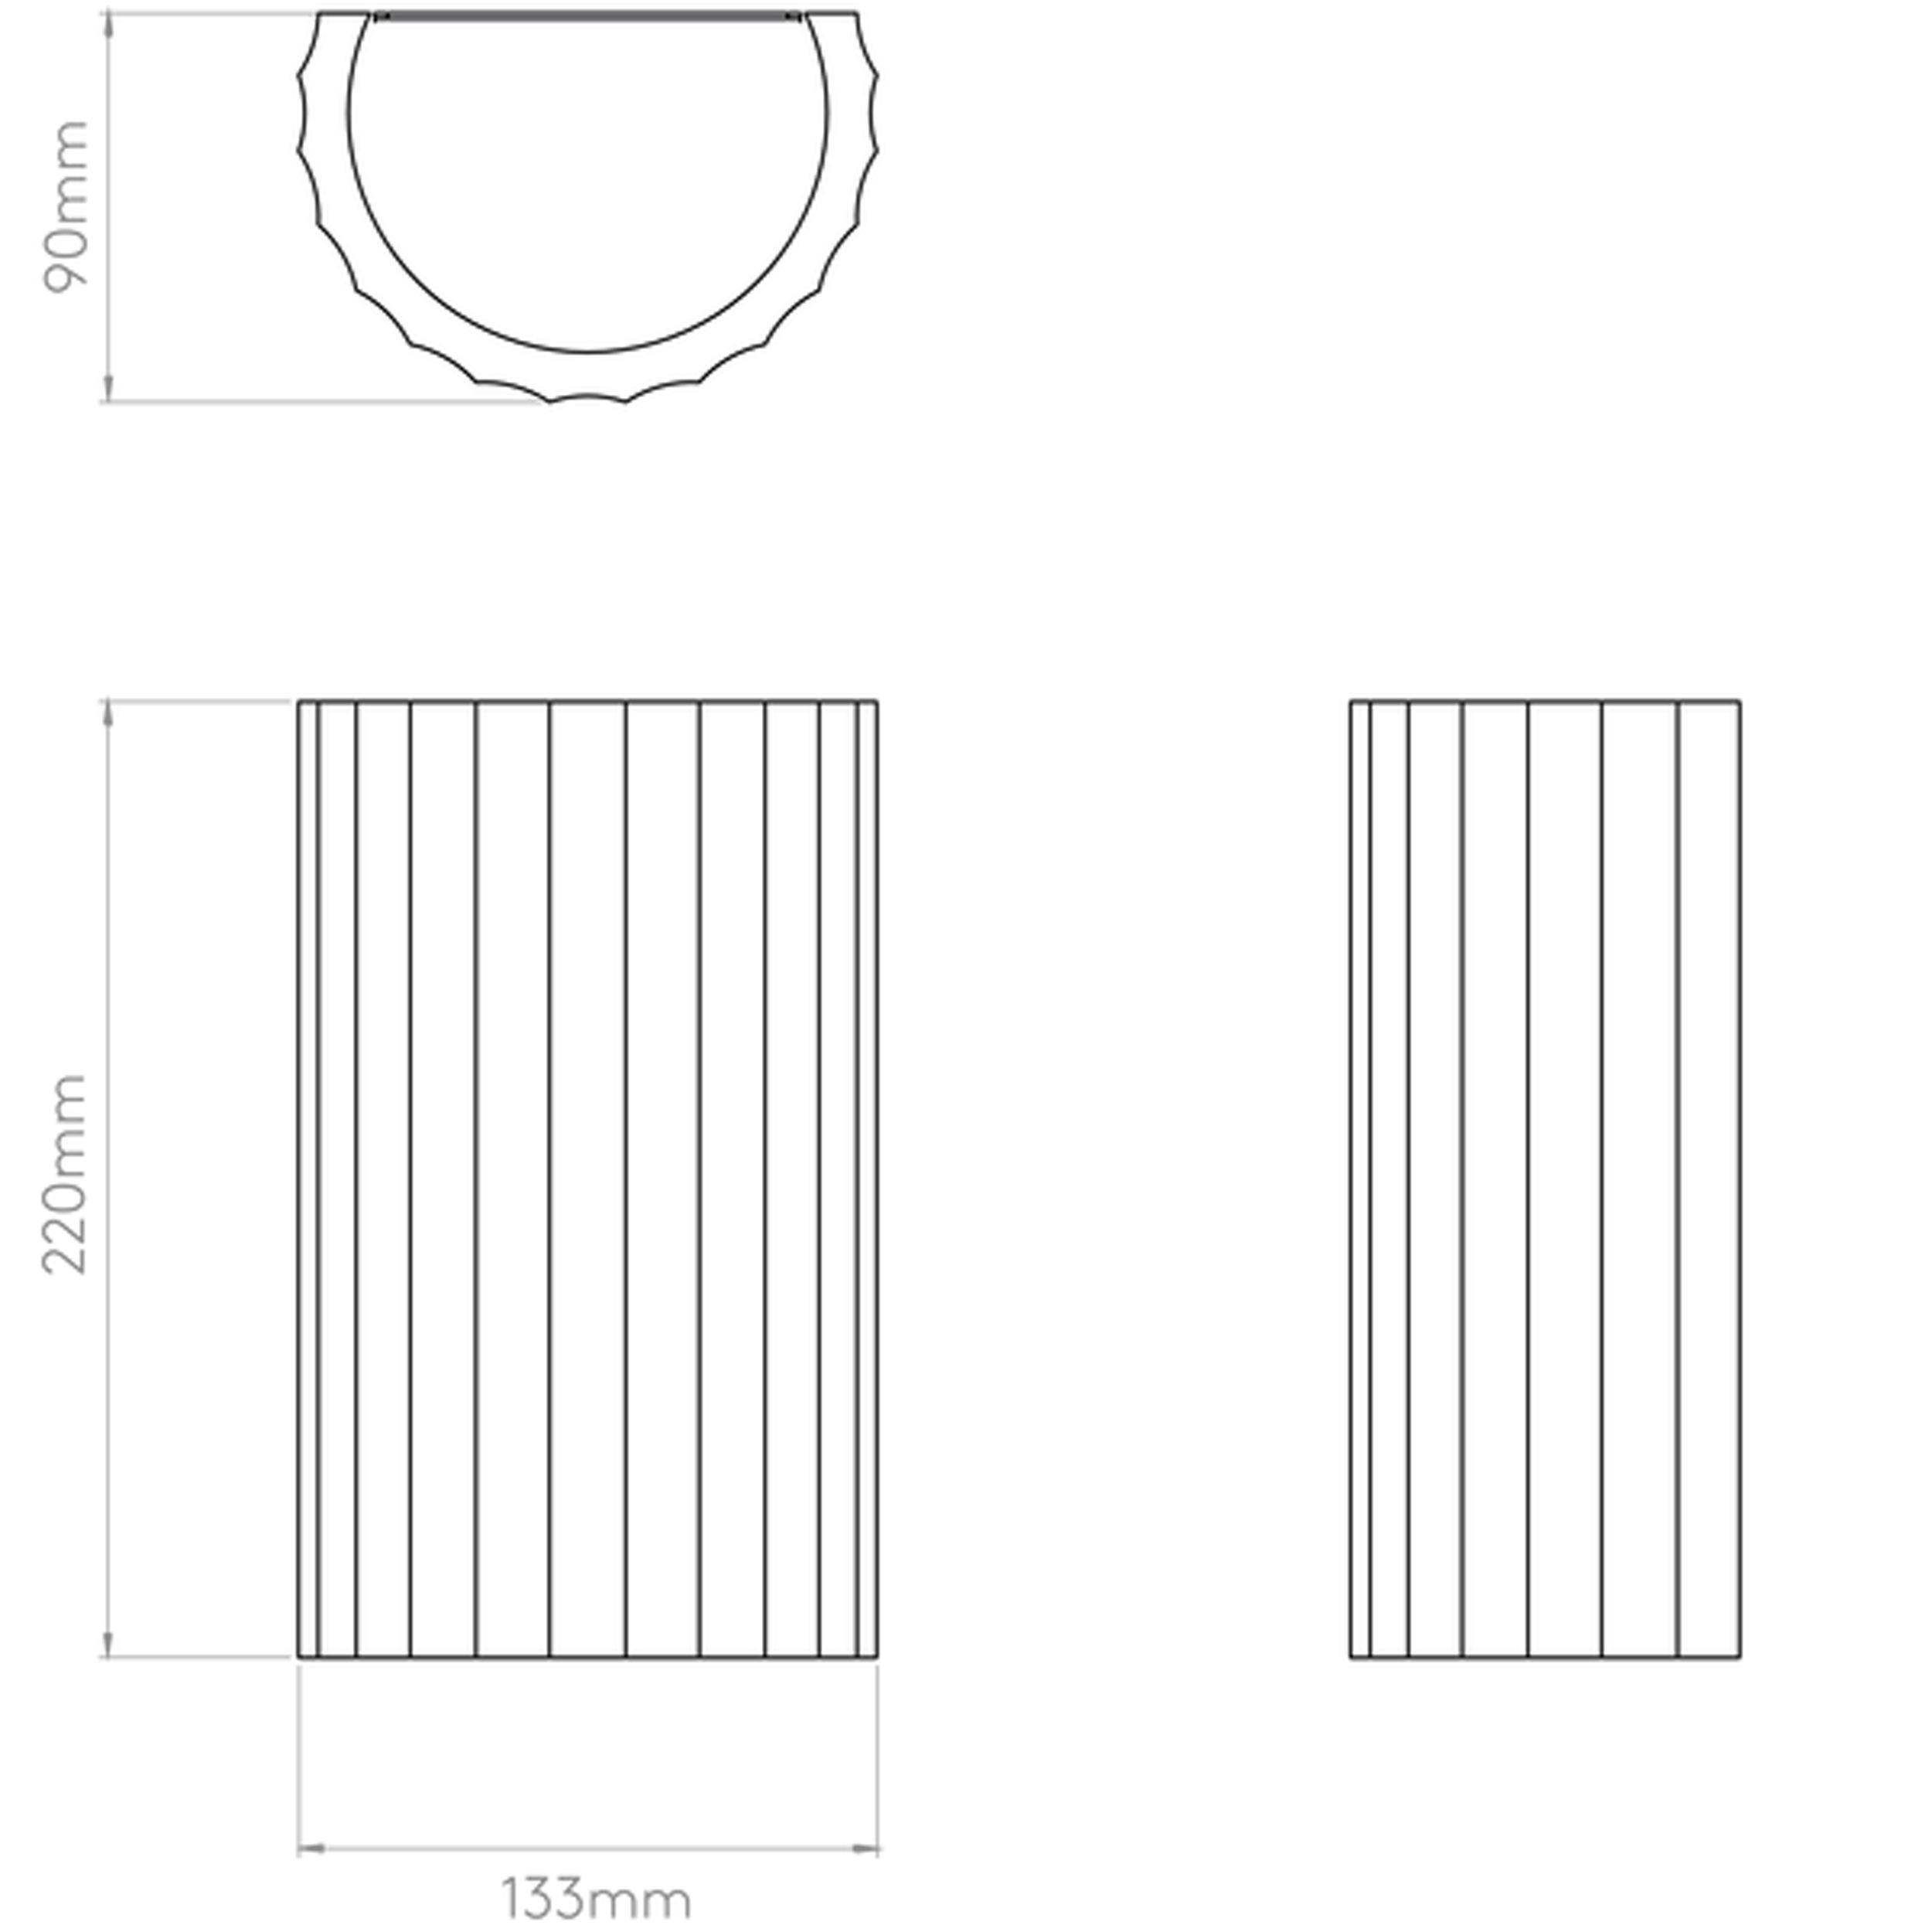 Astro Kymi 220 Wall Light Line Drawing